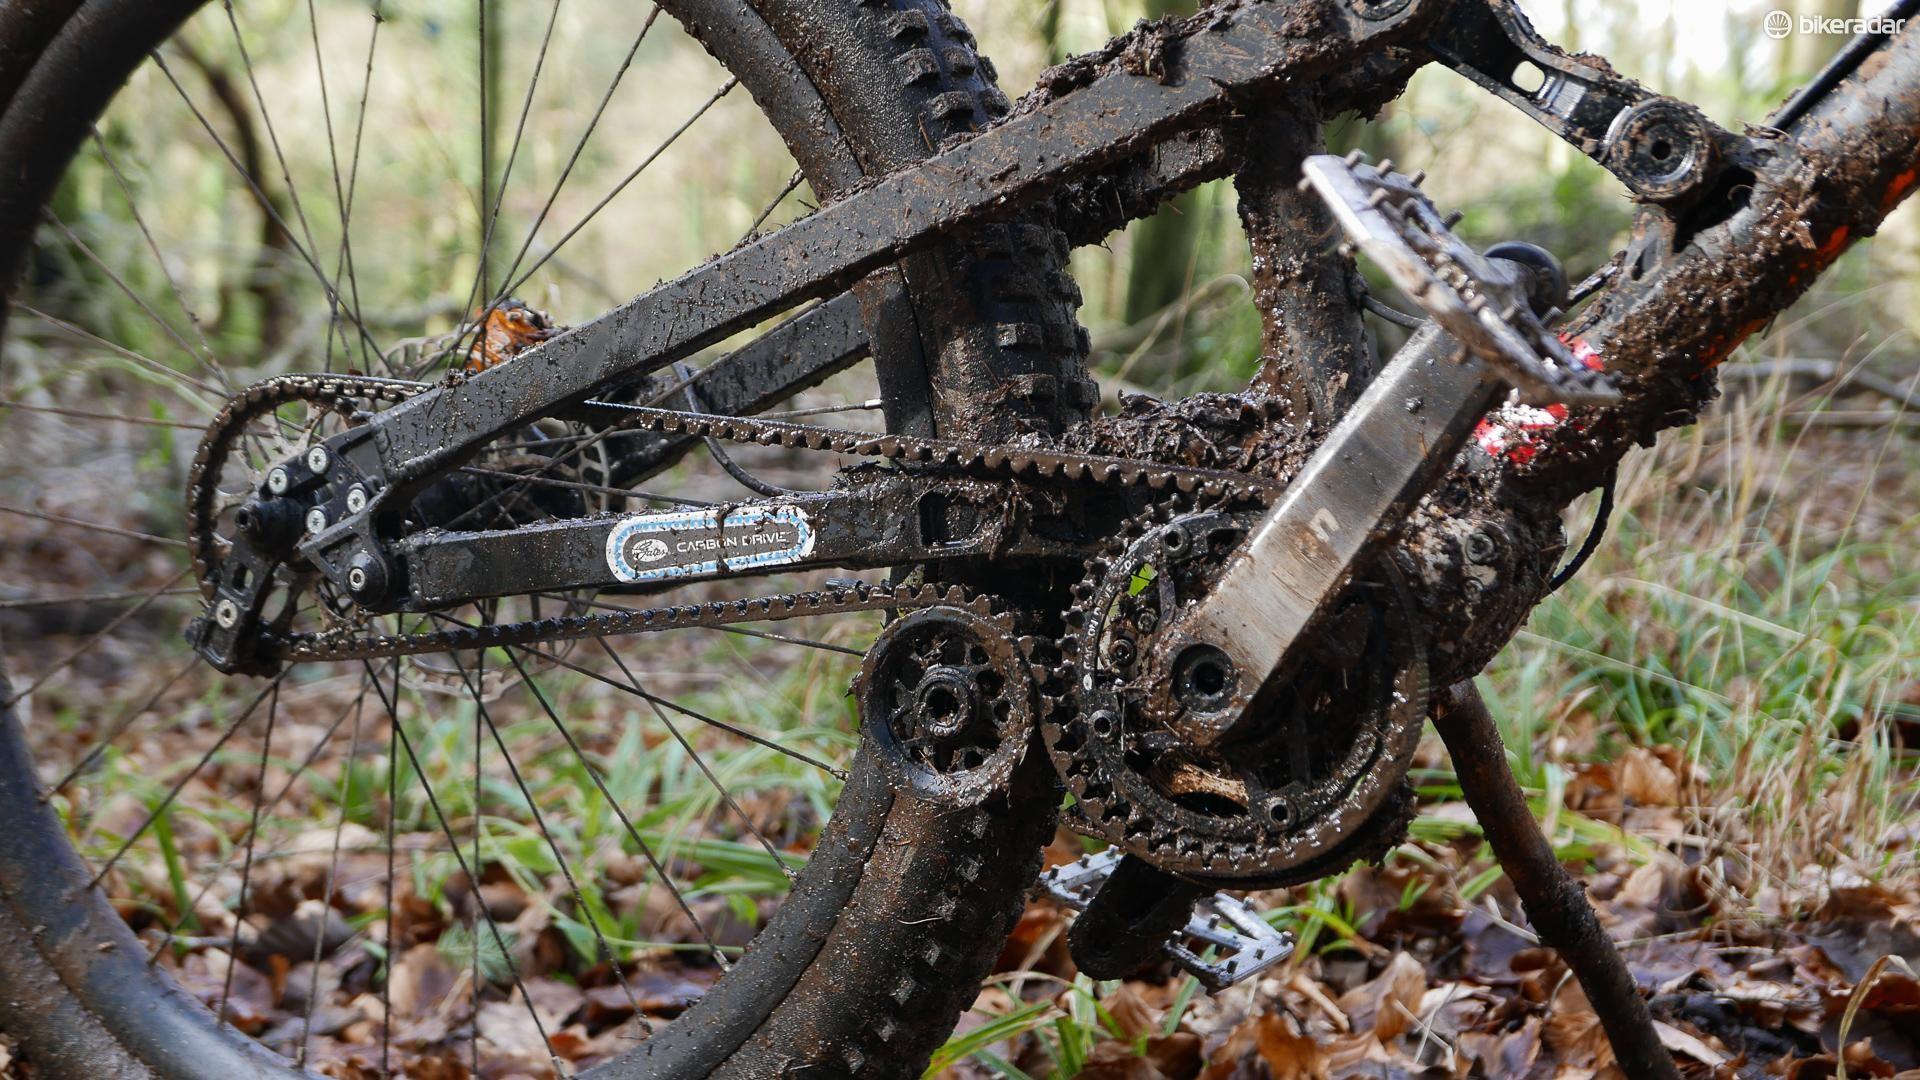 06_bikeradar_bike_of_the_future-1543408847152-1qkdx4c7nv1up-346ea04